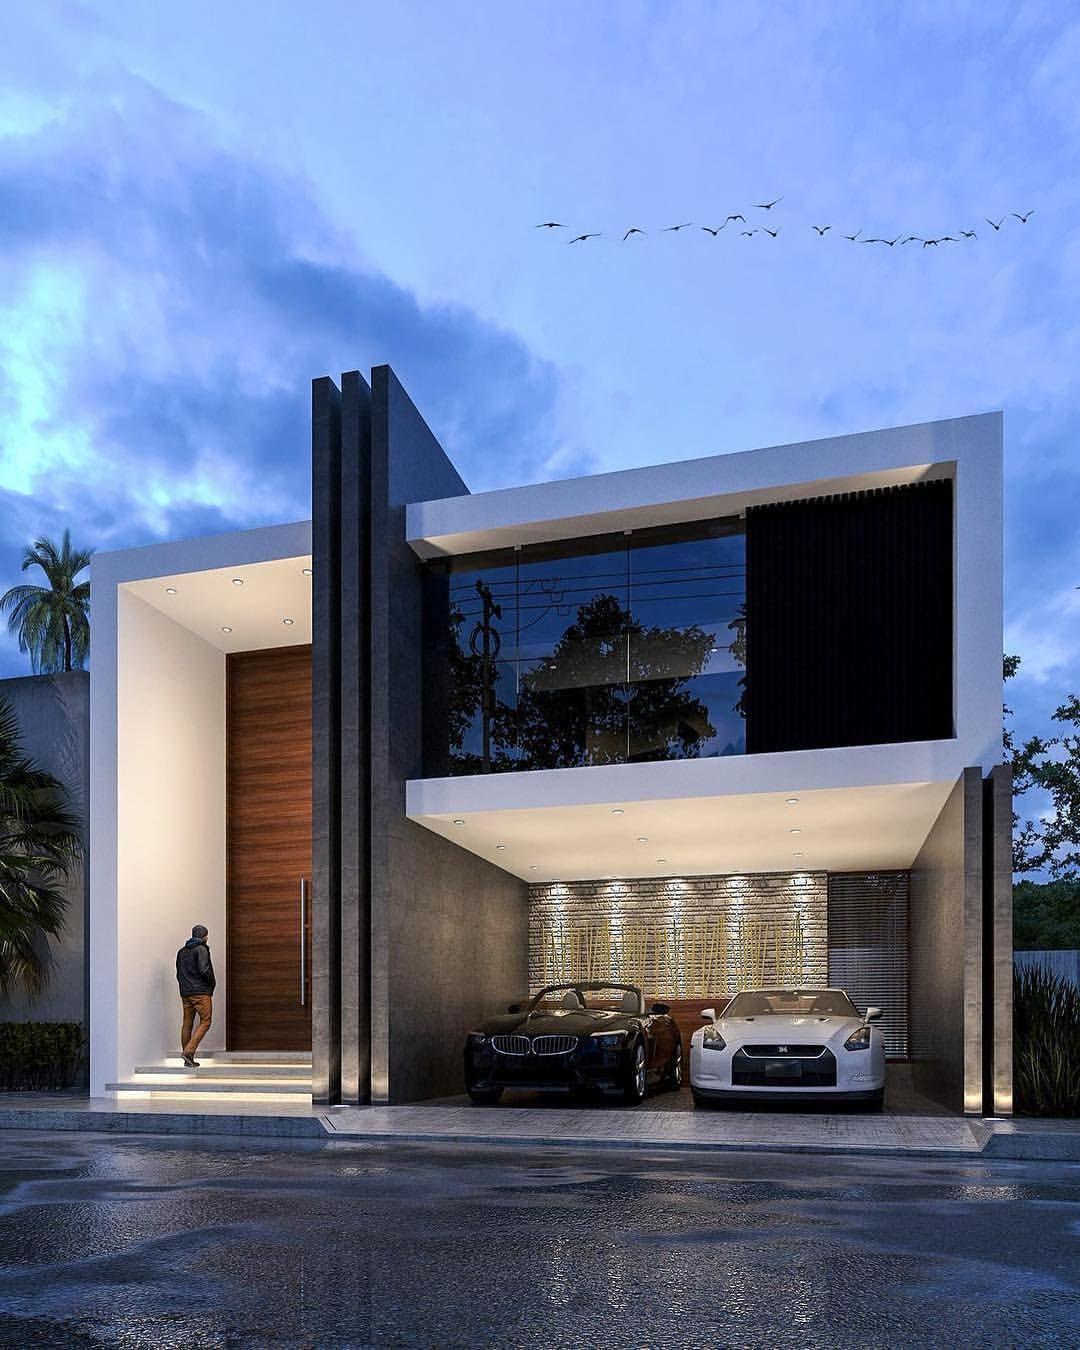 Arquitectura Fachadas De Casas Modernas Casas Modernas: Olivos House Designed By JPR Architecture Location: #puebla #mexico #luxury #luxuryhome